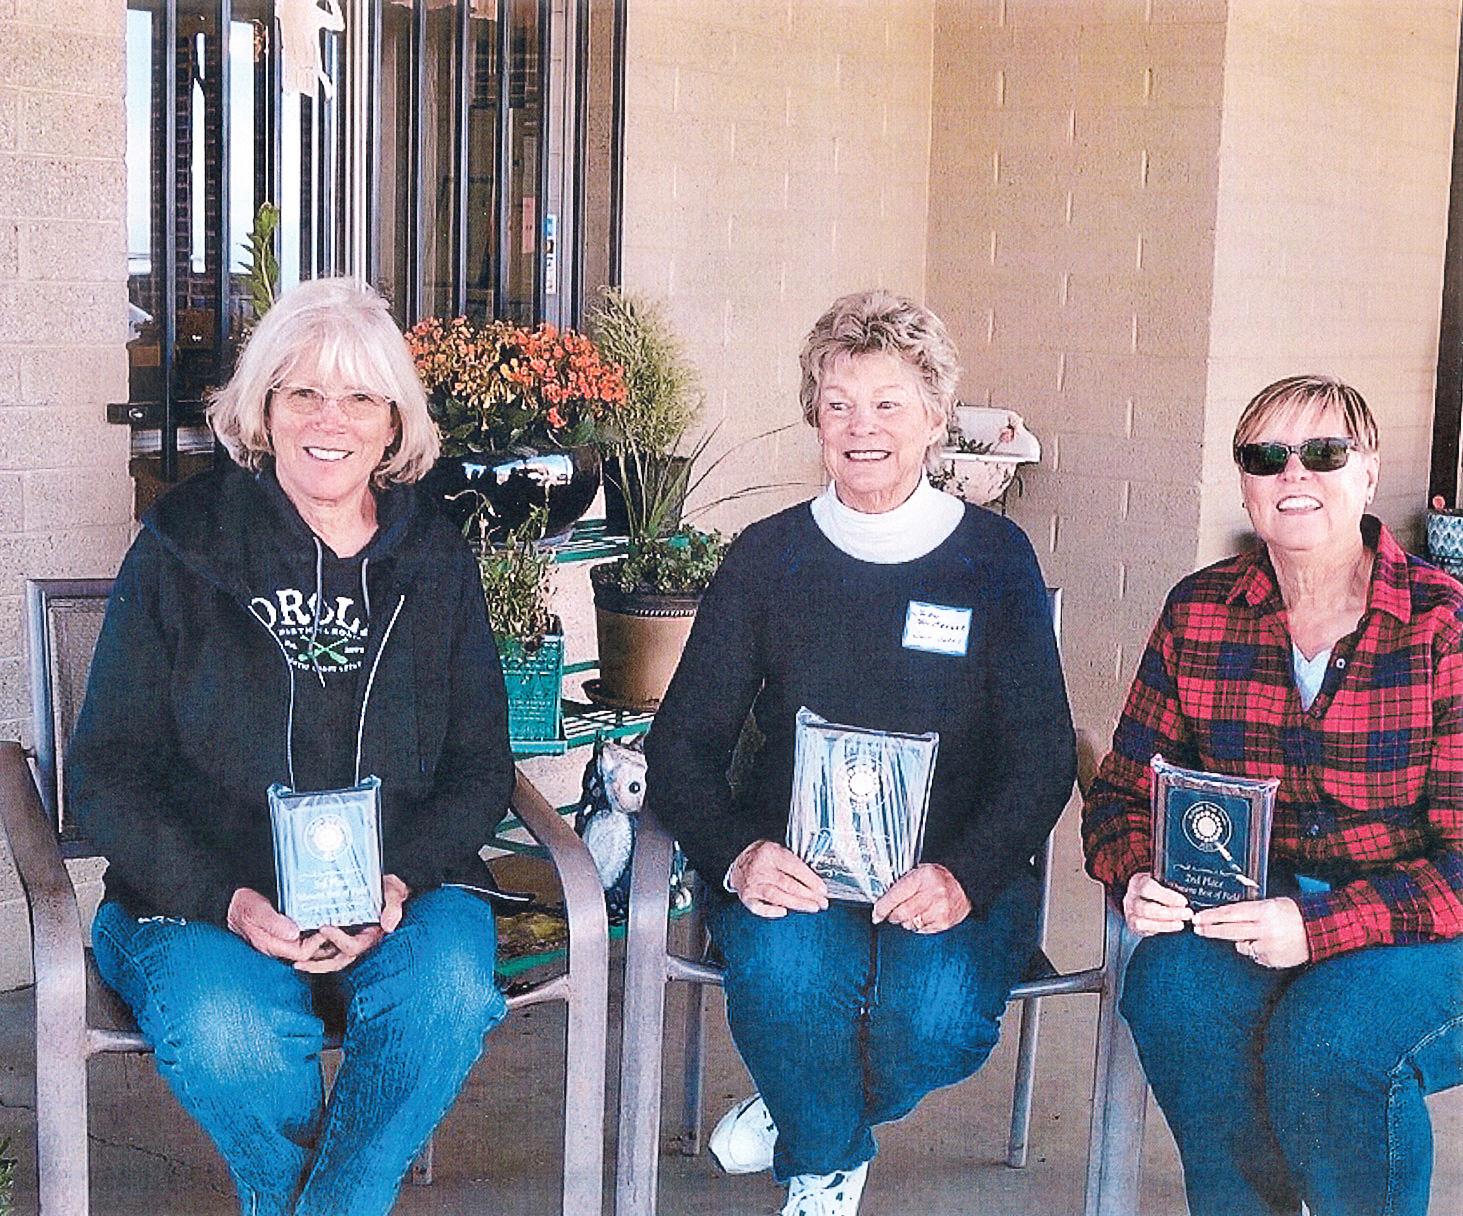 Top women shooters: second place, Lori Klug, Quail Creek, 42; first place, Judy Tenbroeck, Sun Lakes, 65; and third place, Vicki Ray, PebbleCreek, 42